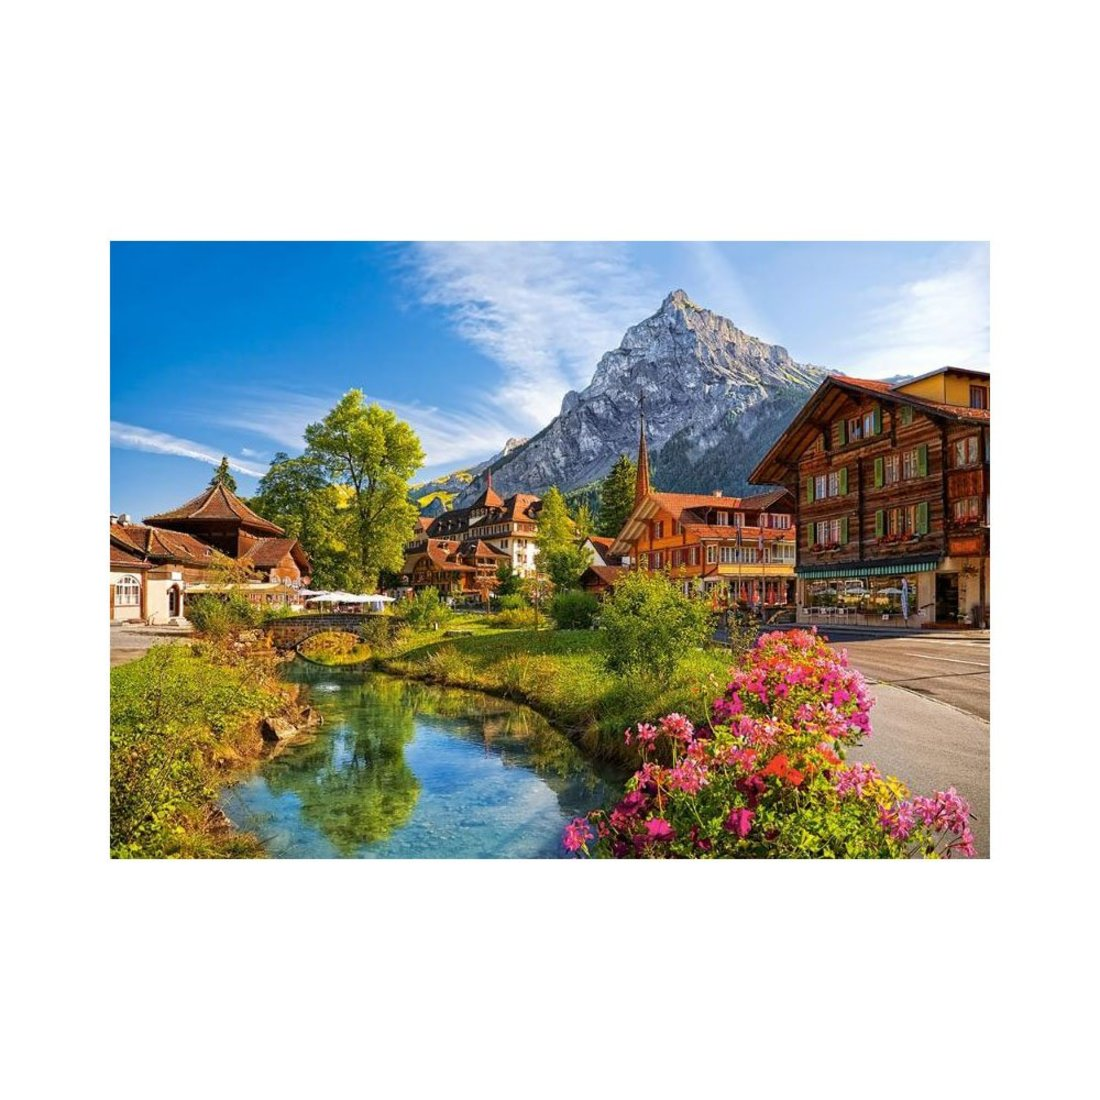 Пазлы 500 Кандерштег, Швейцария